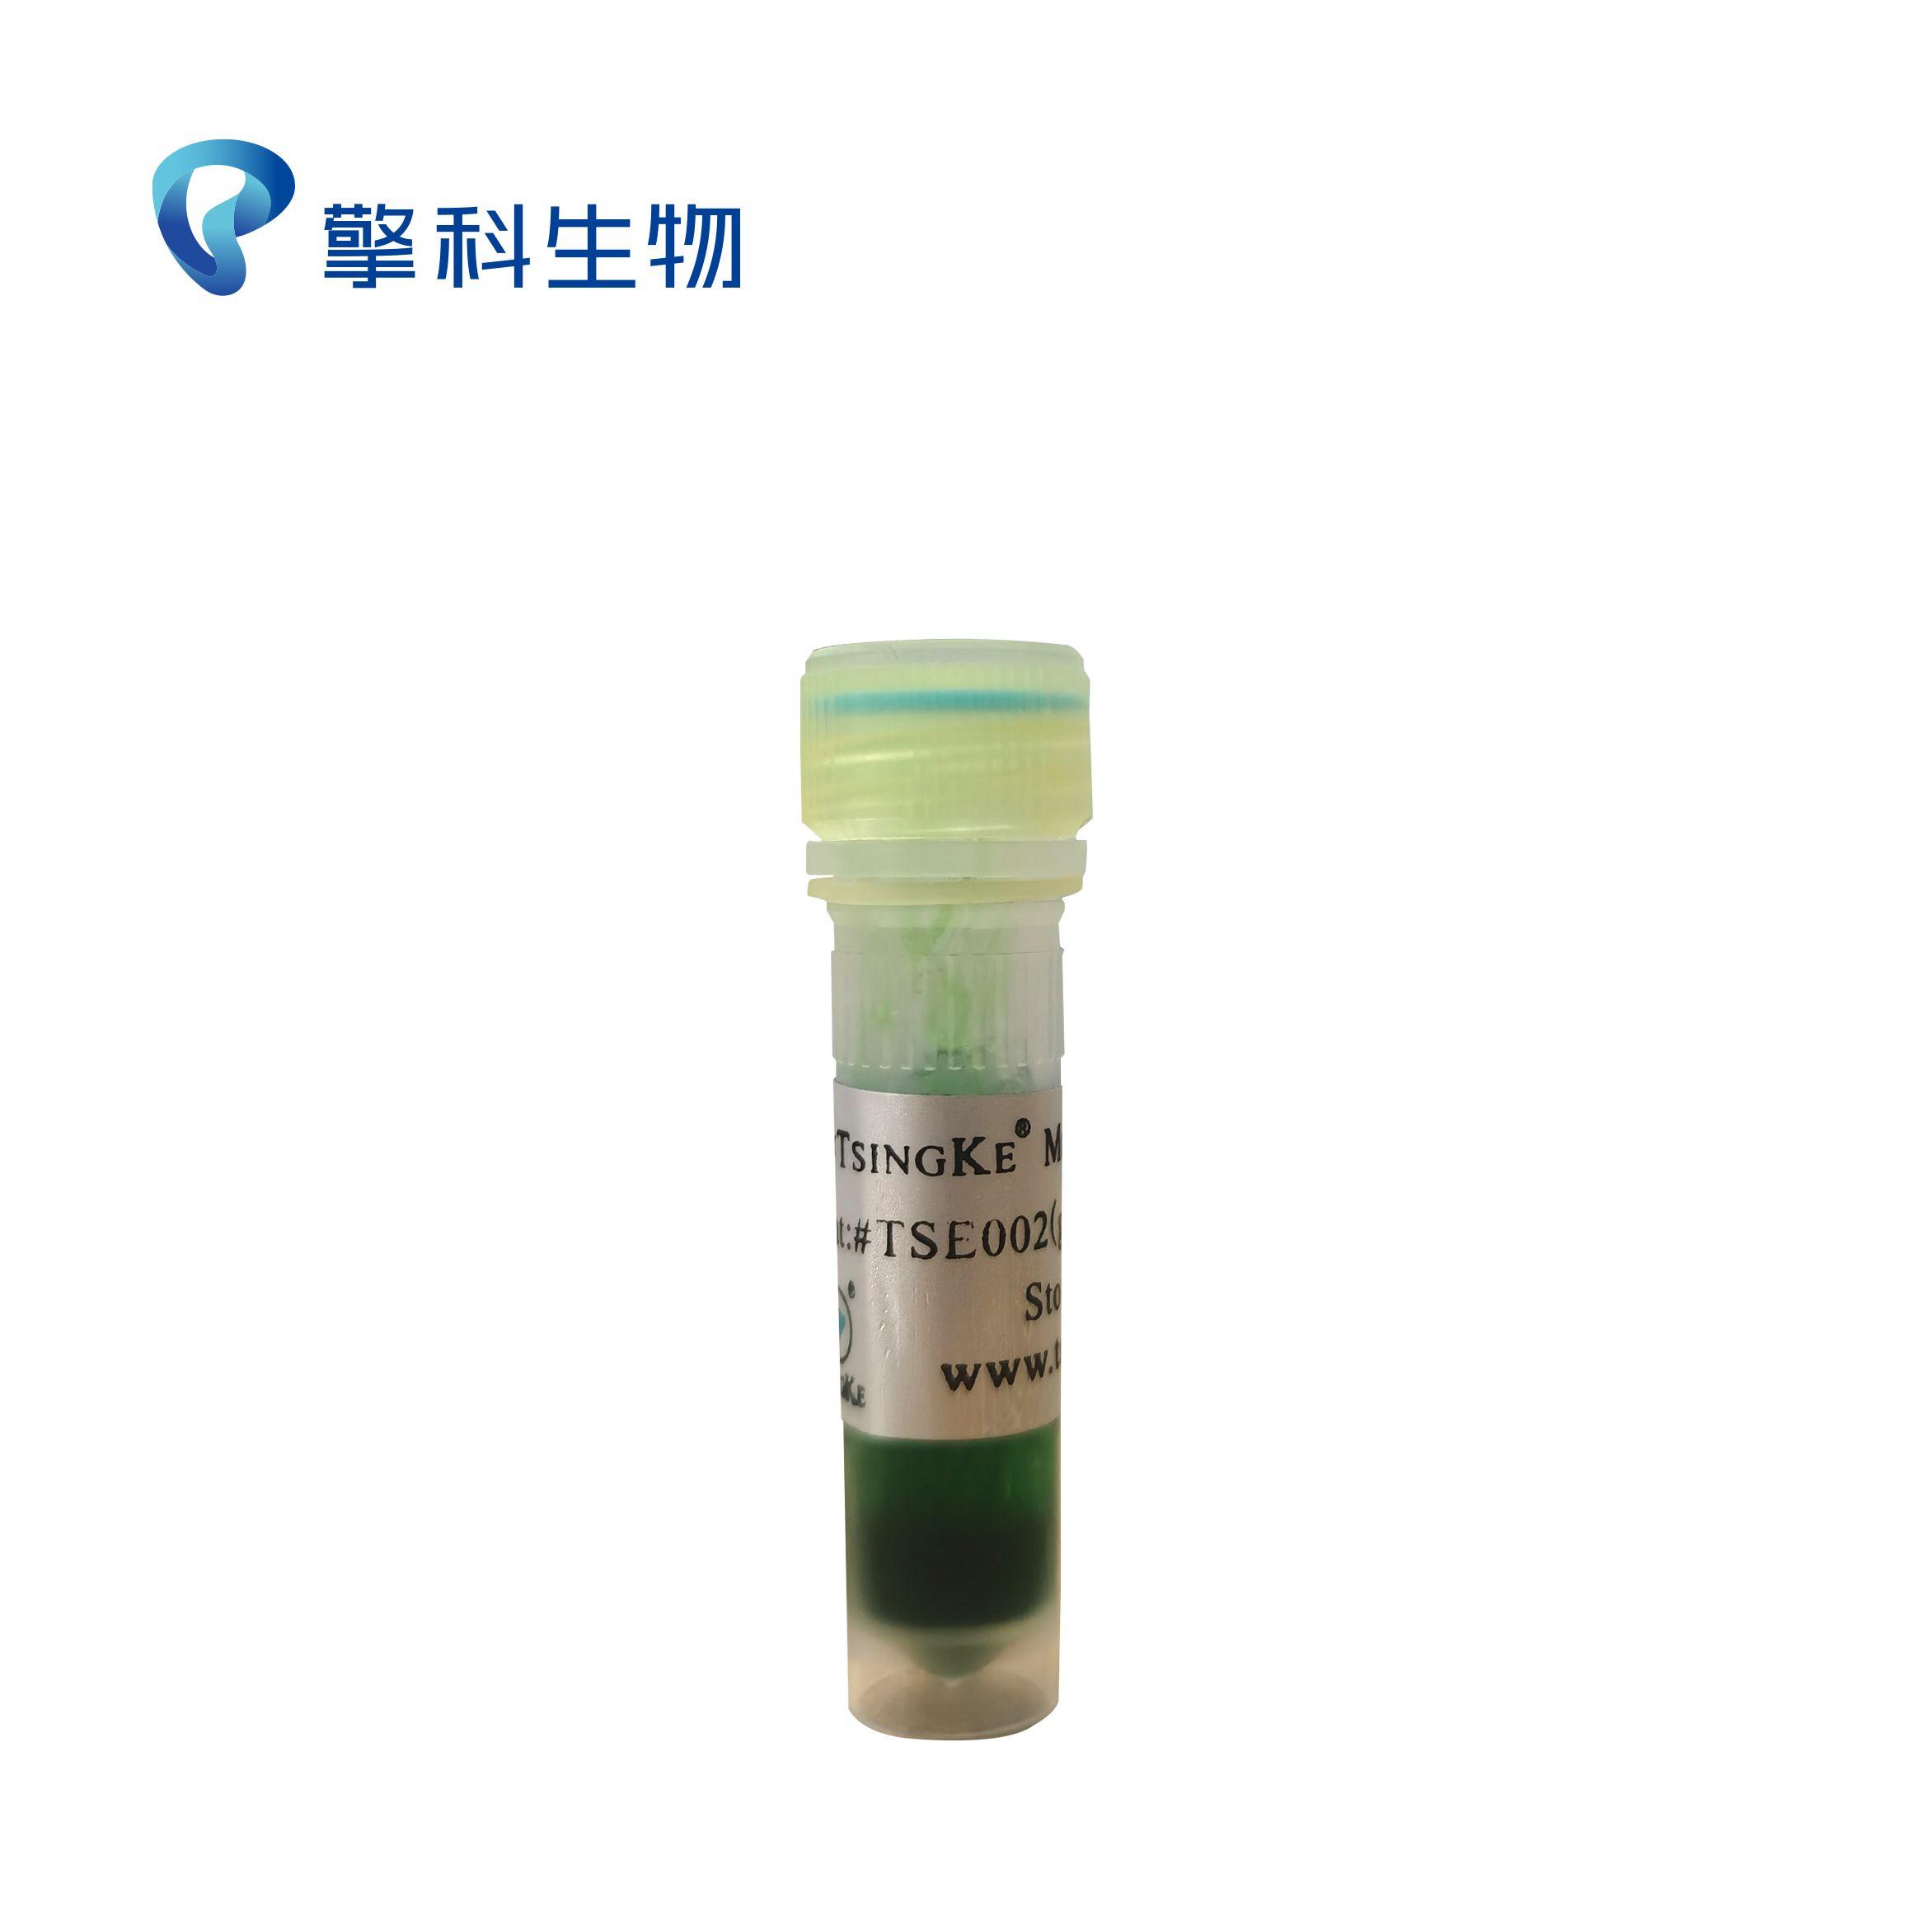 2×TSINGKE Master Mix(Green)/PAGE专用PCRmix,简便稳定/PCR系列/PAGE专用PCRmix,简便稳定/擎科生物TSINGKE